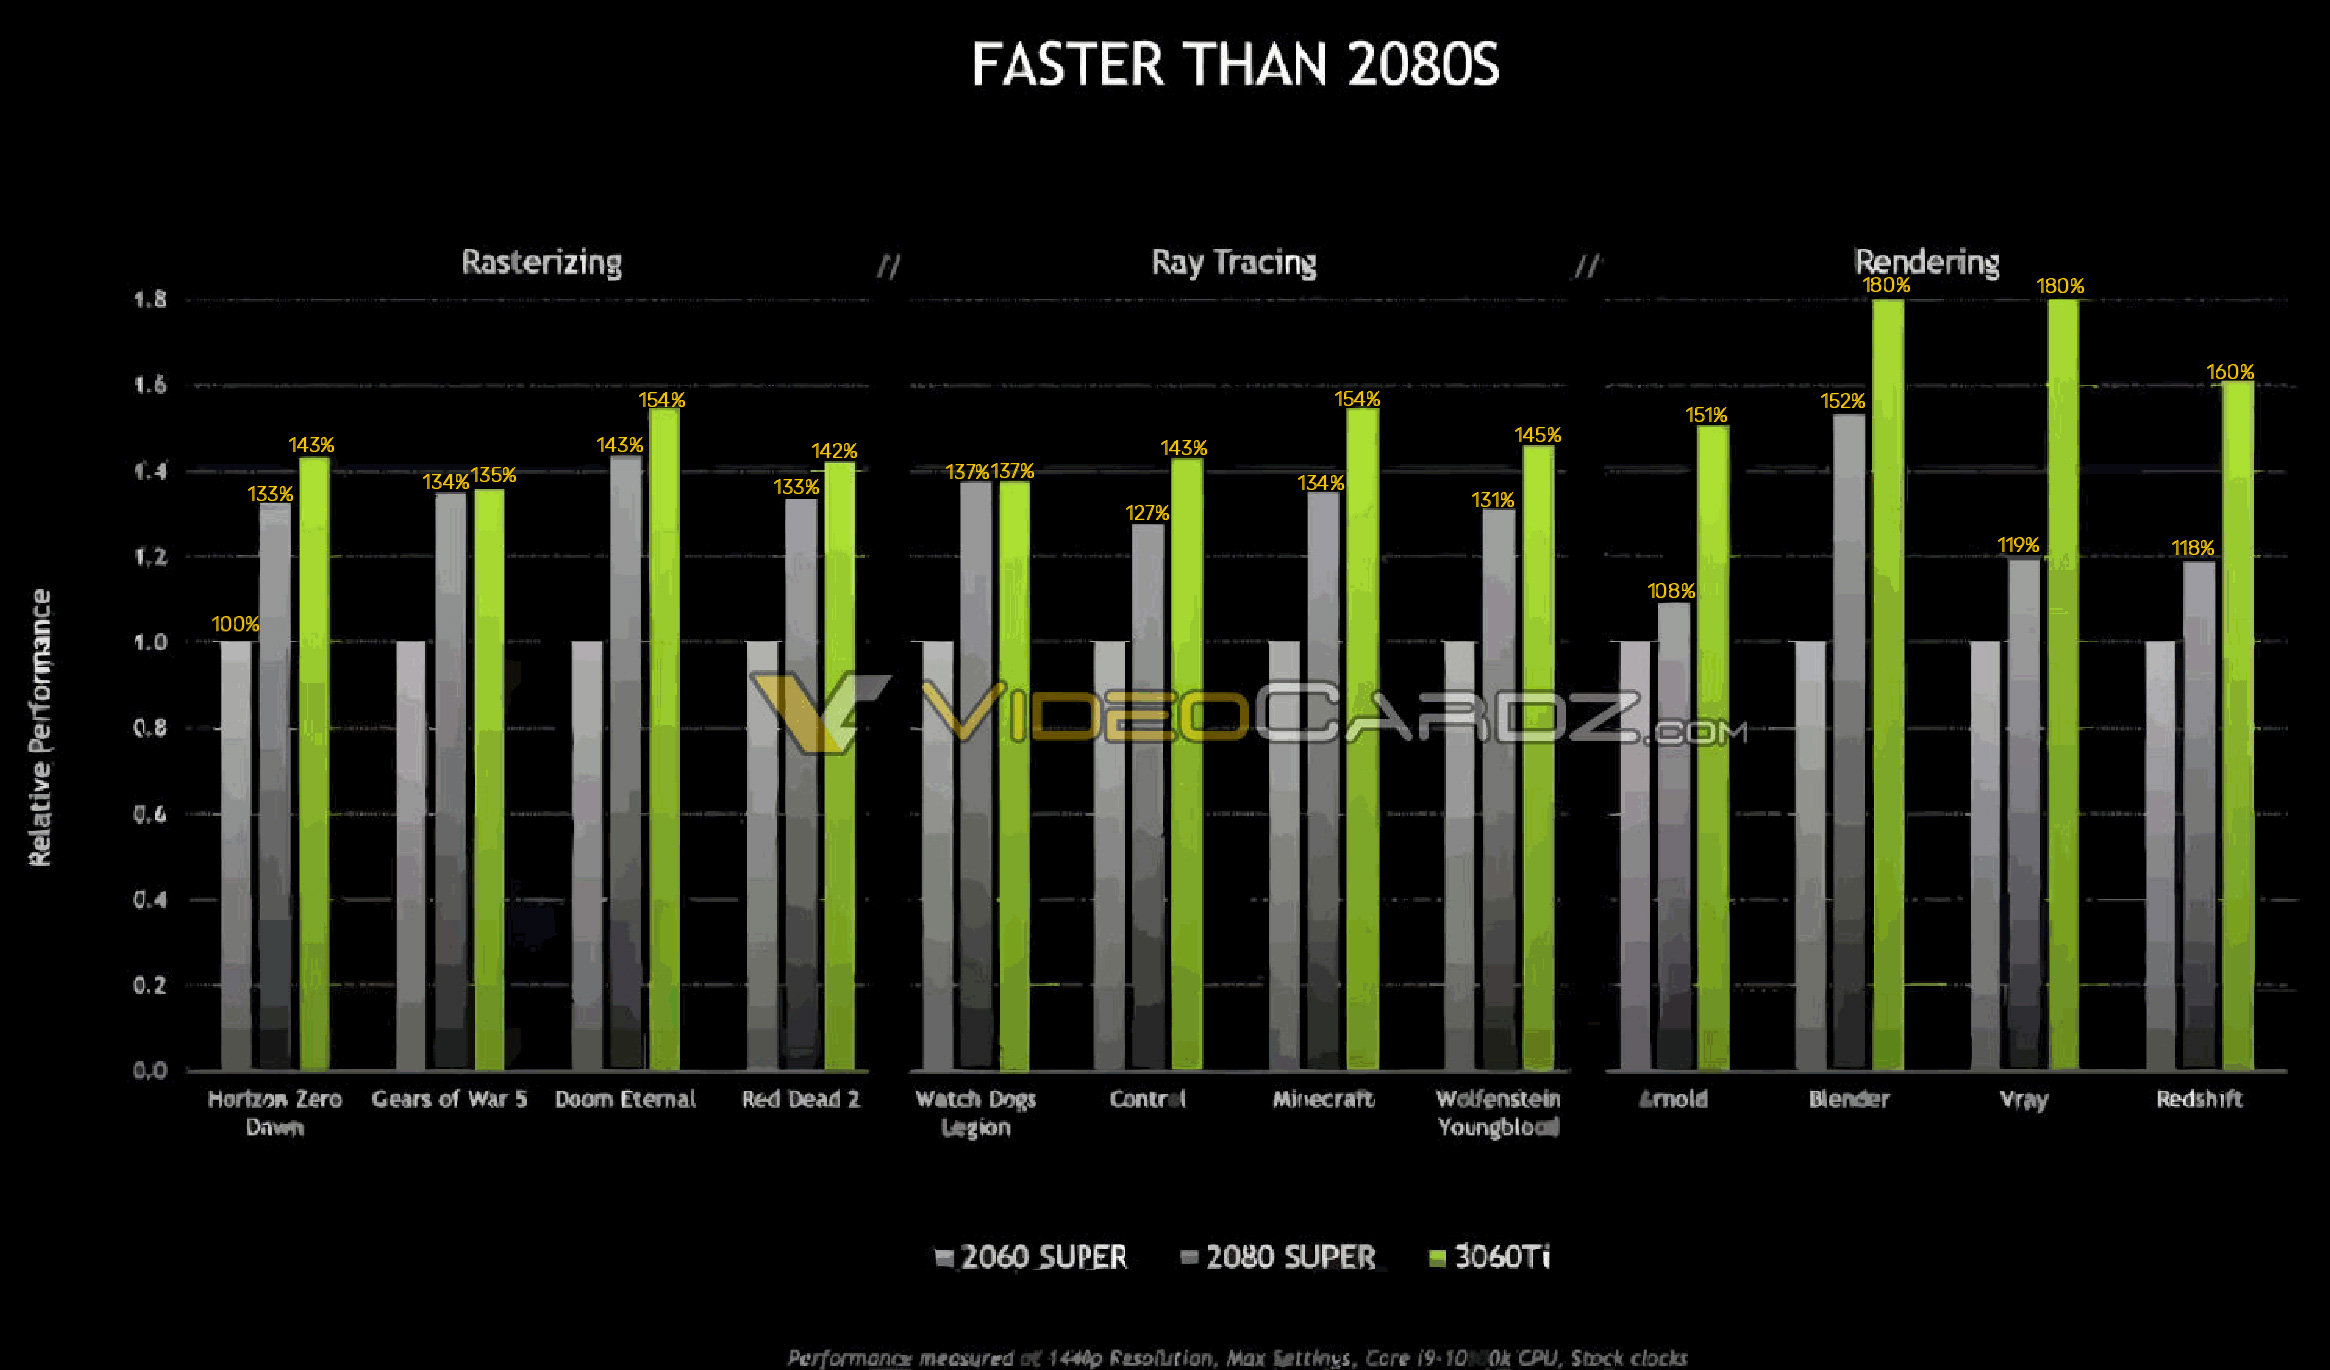 GeForce RTX 3060 Ti Vs GeForce RTX 3080 Super